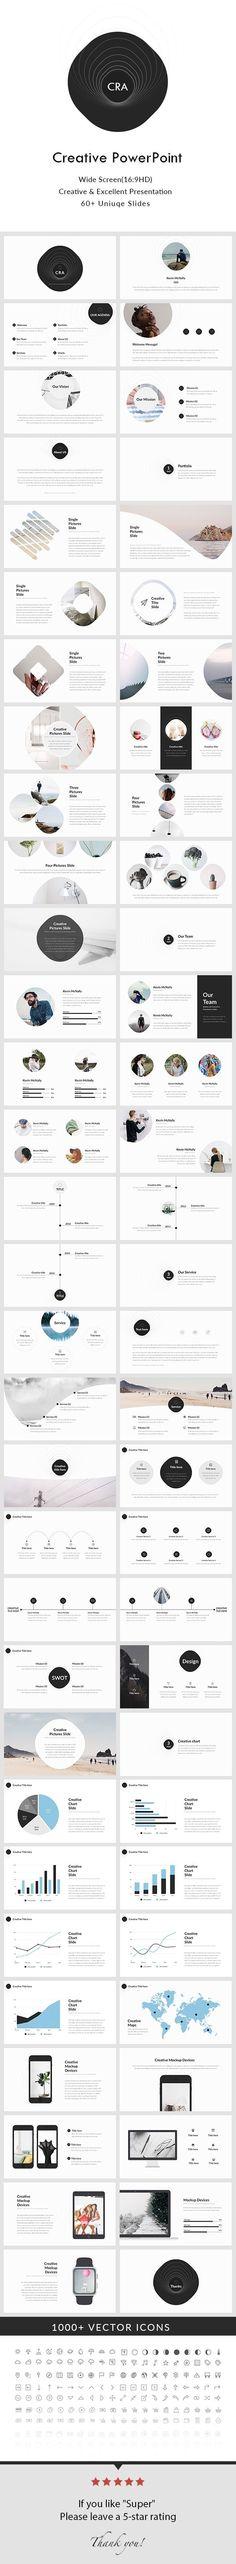 Creative PowerPoint Presentation Template — Powerpoint PPT #chart #modern